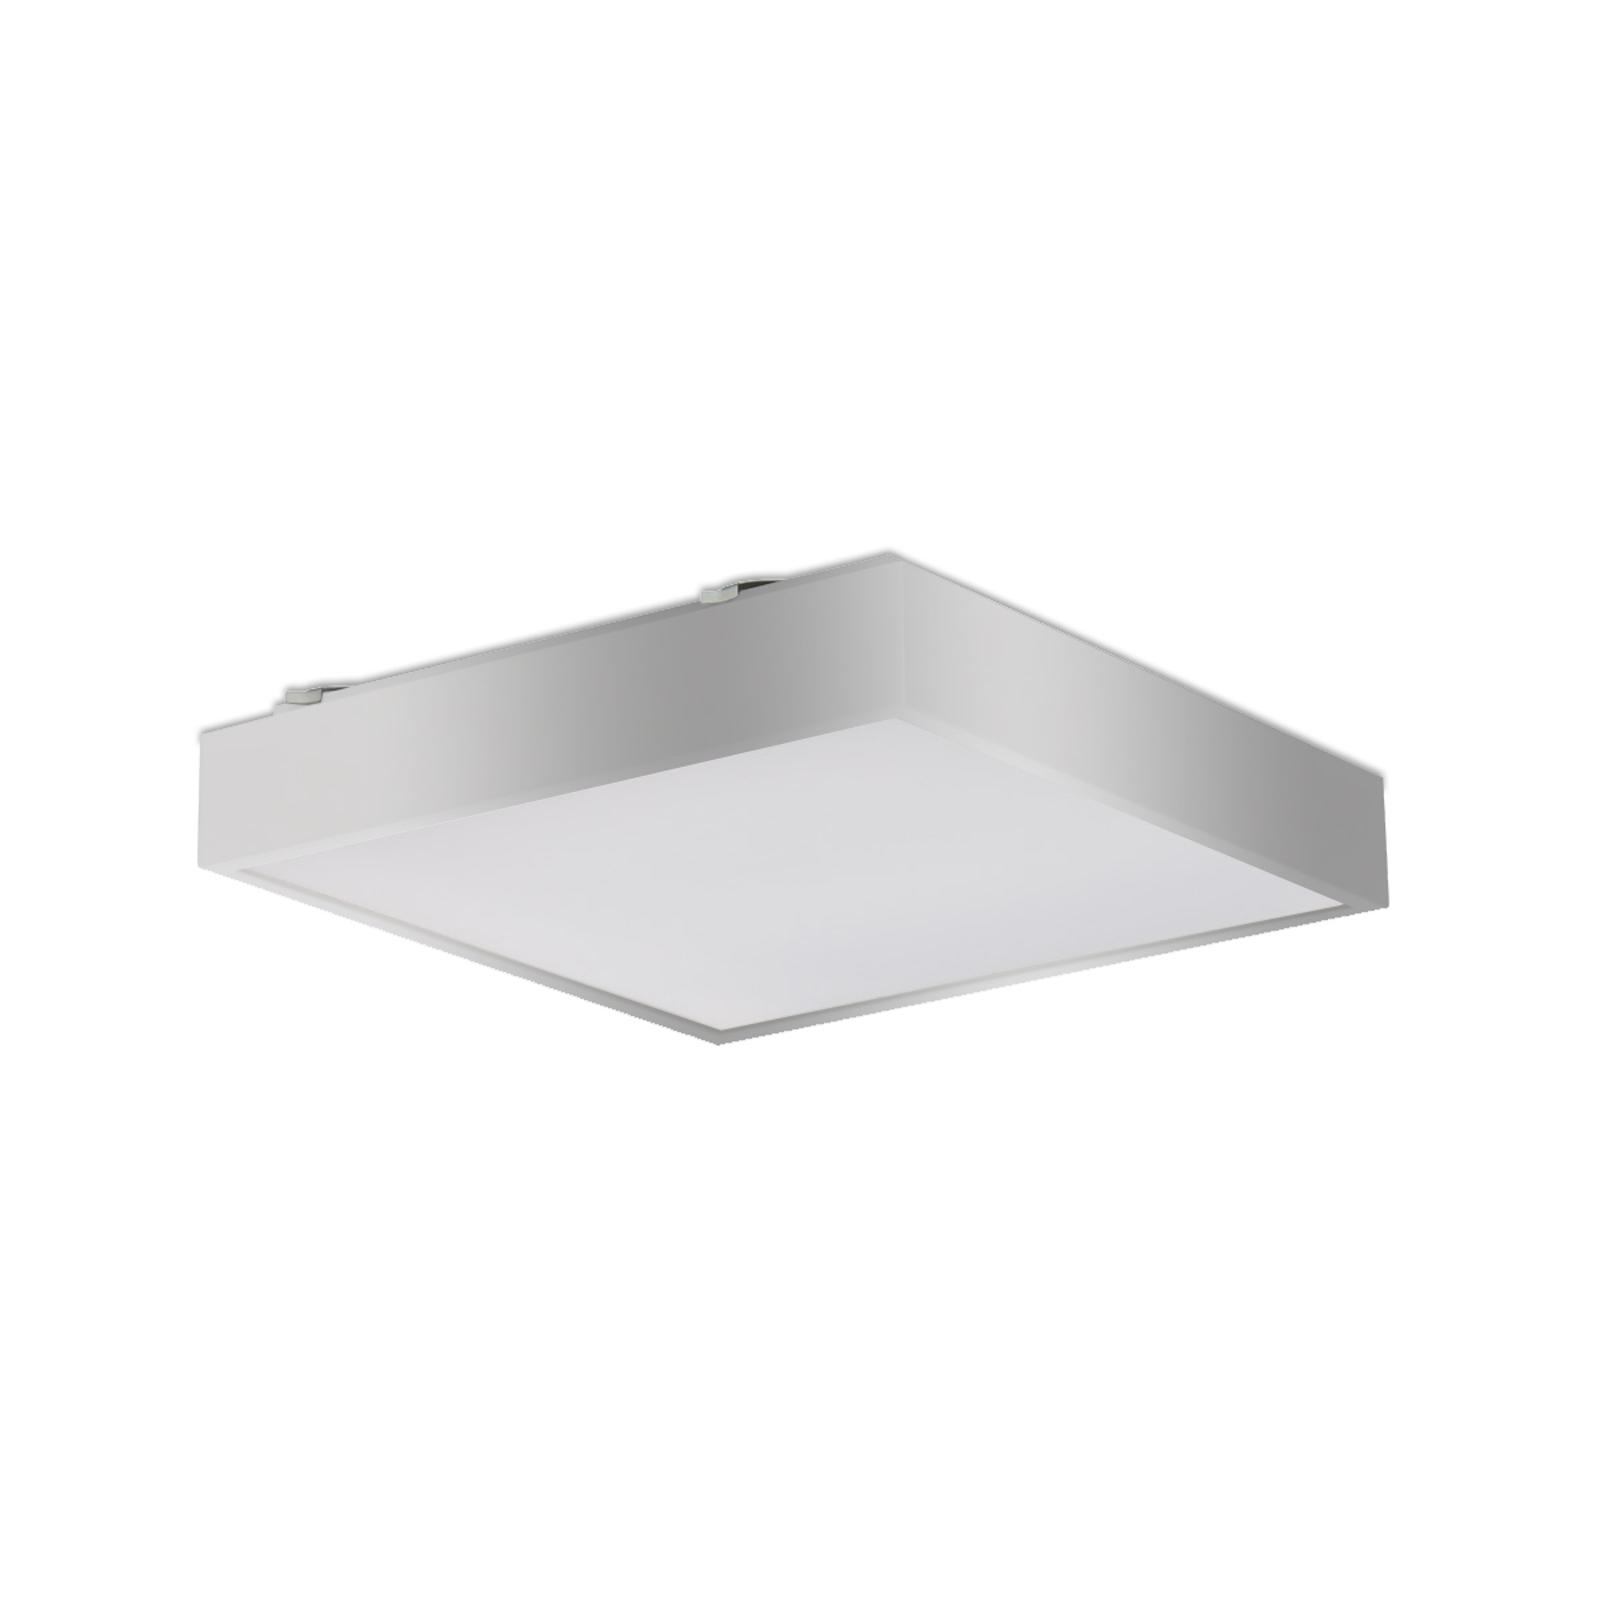 Q4 - led-plafondlamp, zilverkleurig, DALI